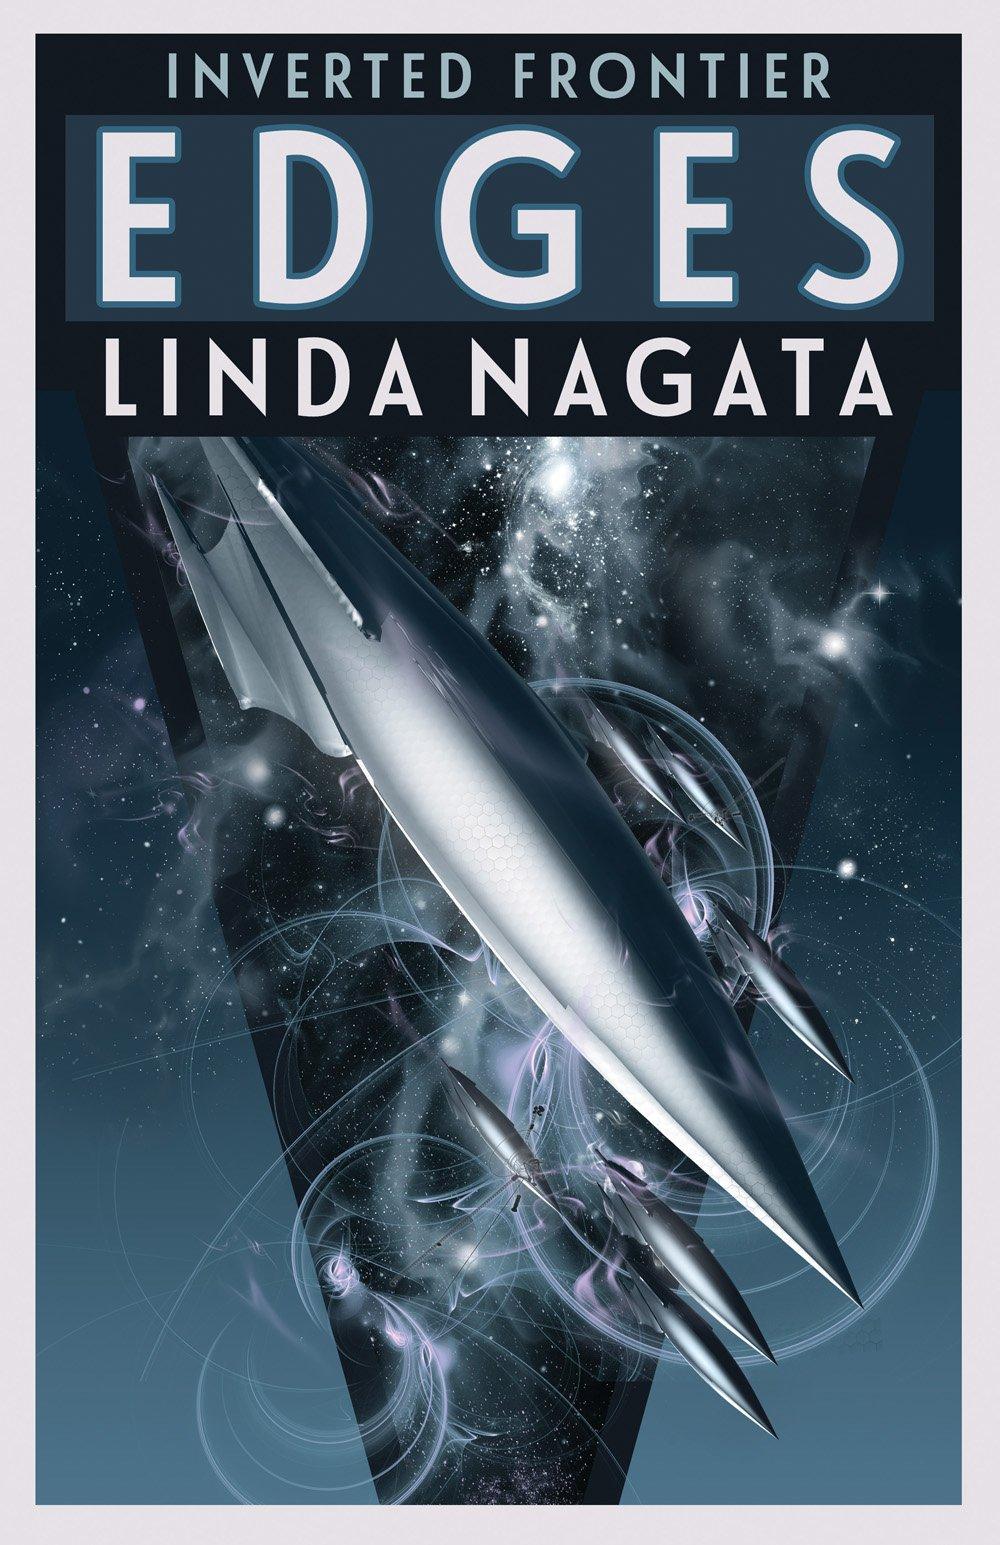 Edges-Inverted Frontier_Linda Nagata.jpg